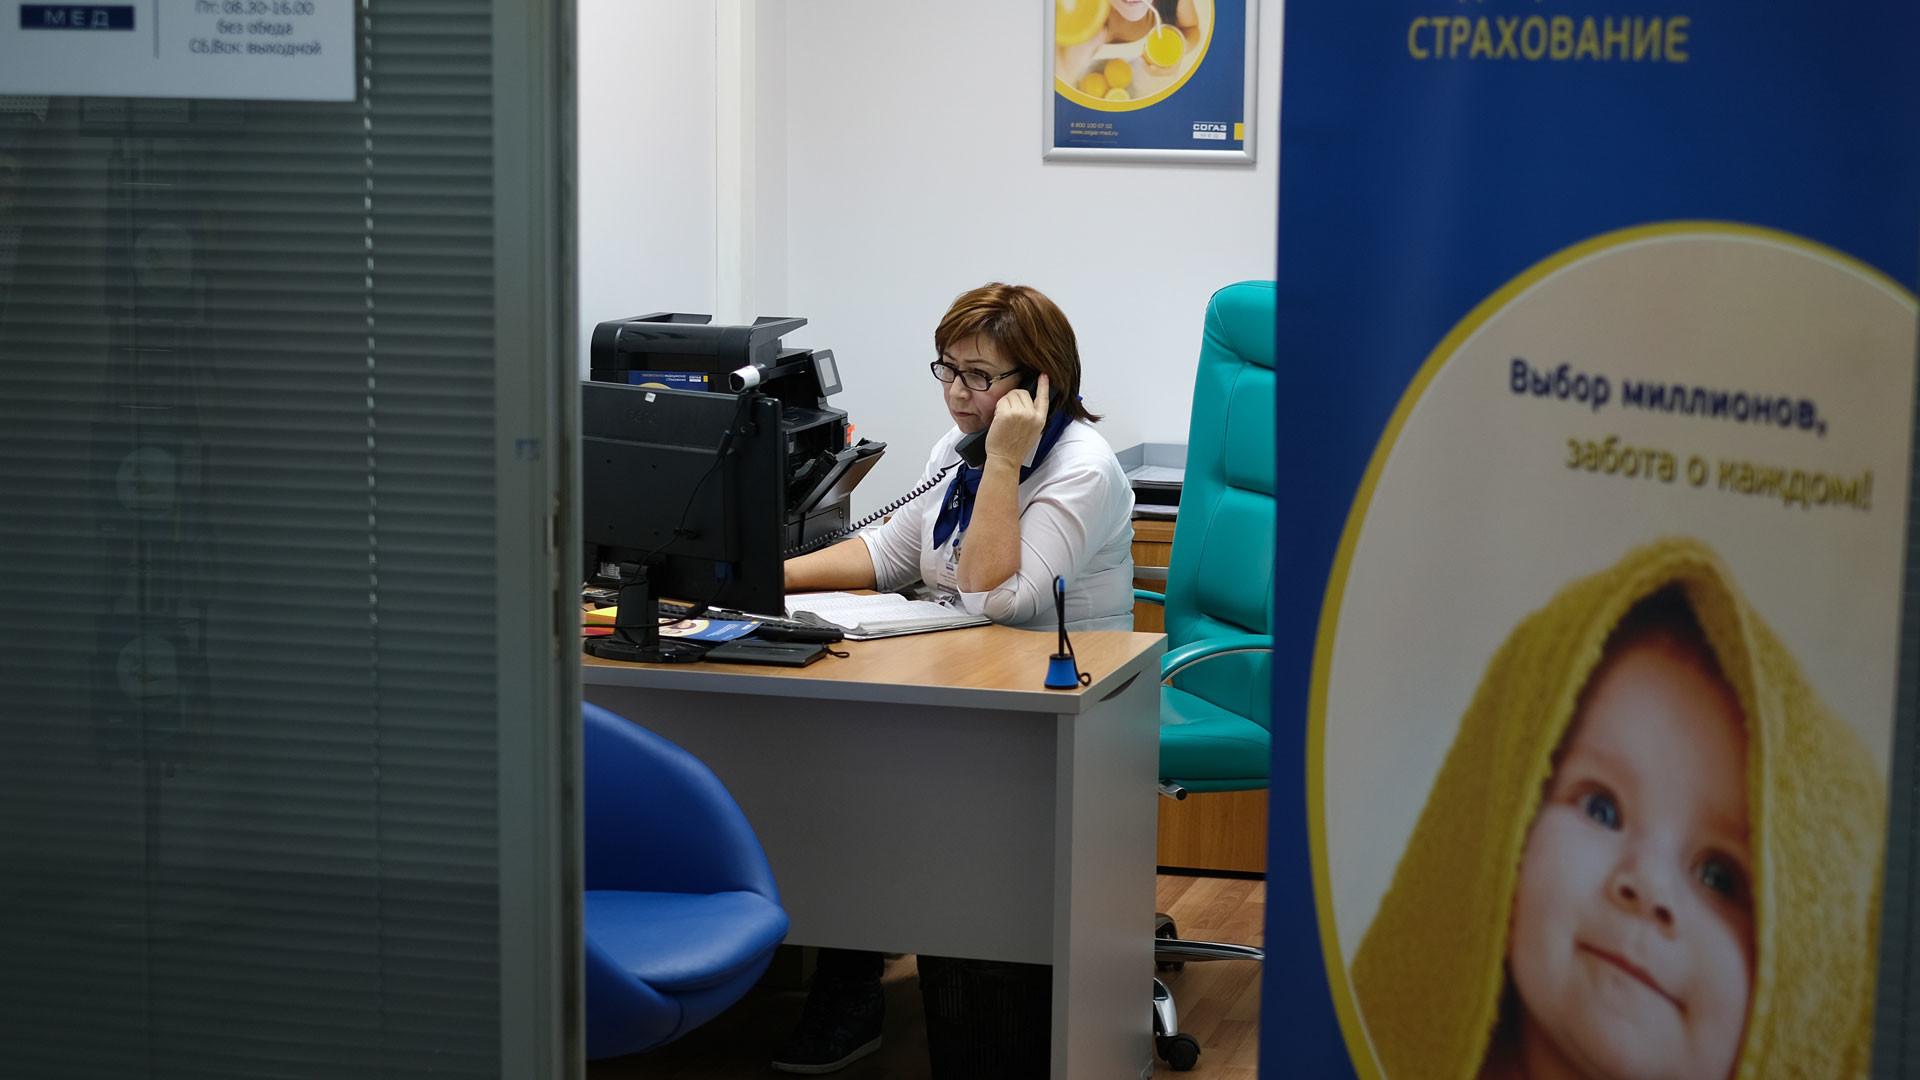 <p>Фото: &copy; РИА Новости/Максим Блинов</p> <div> <div></div> </div>